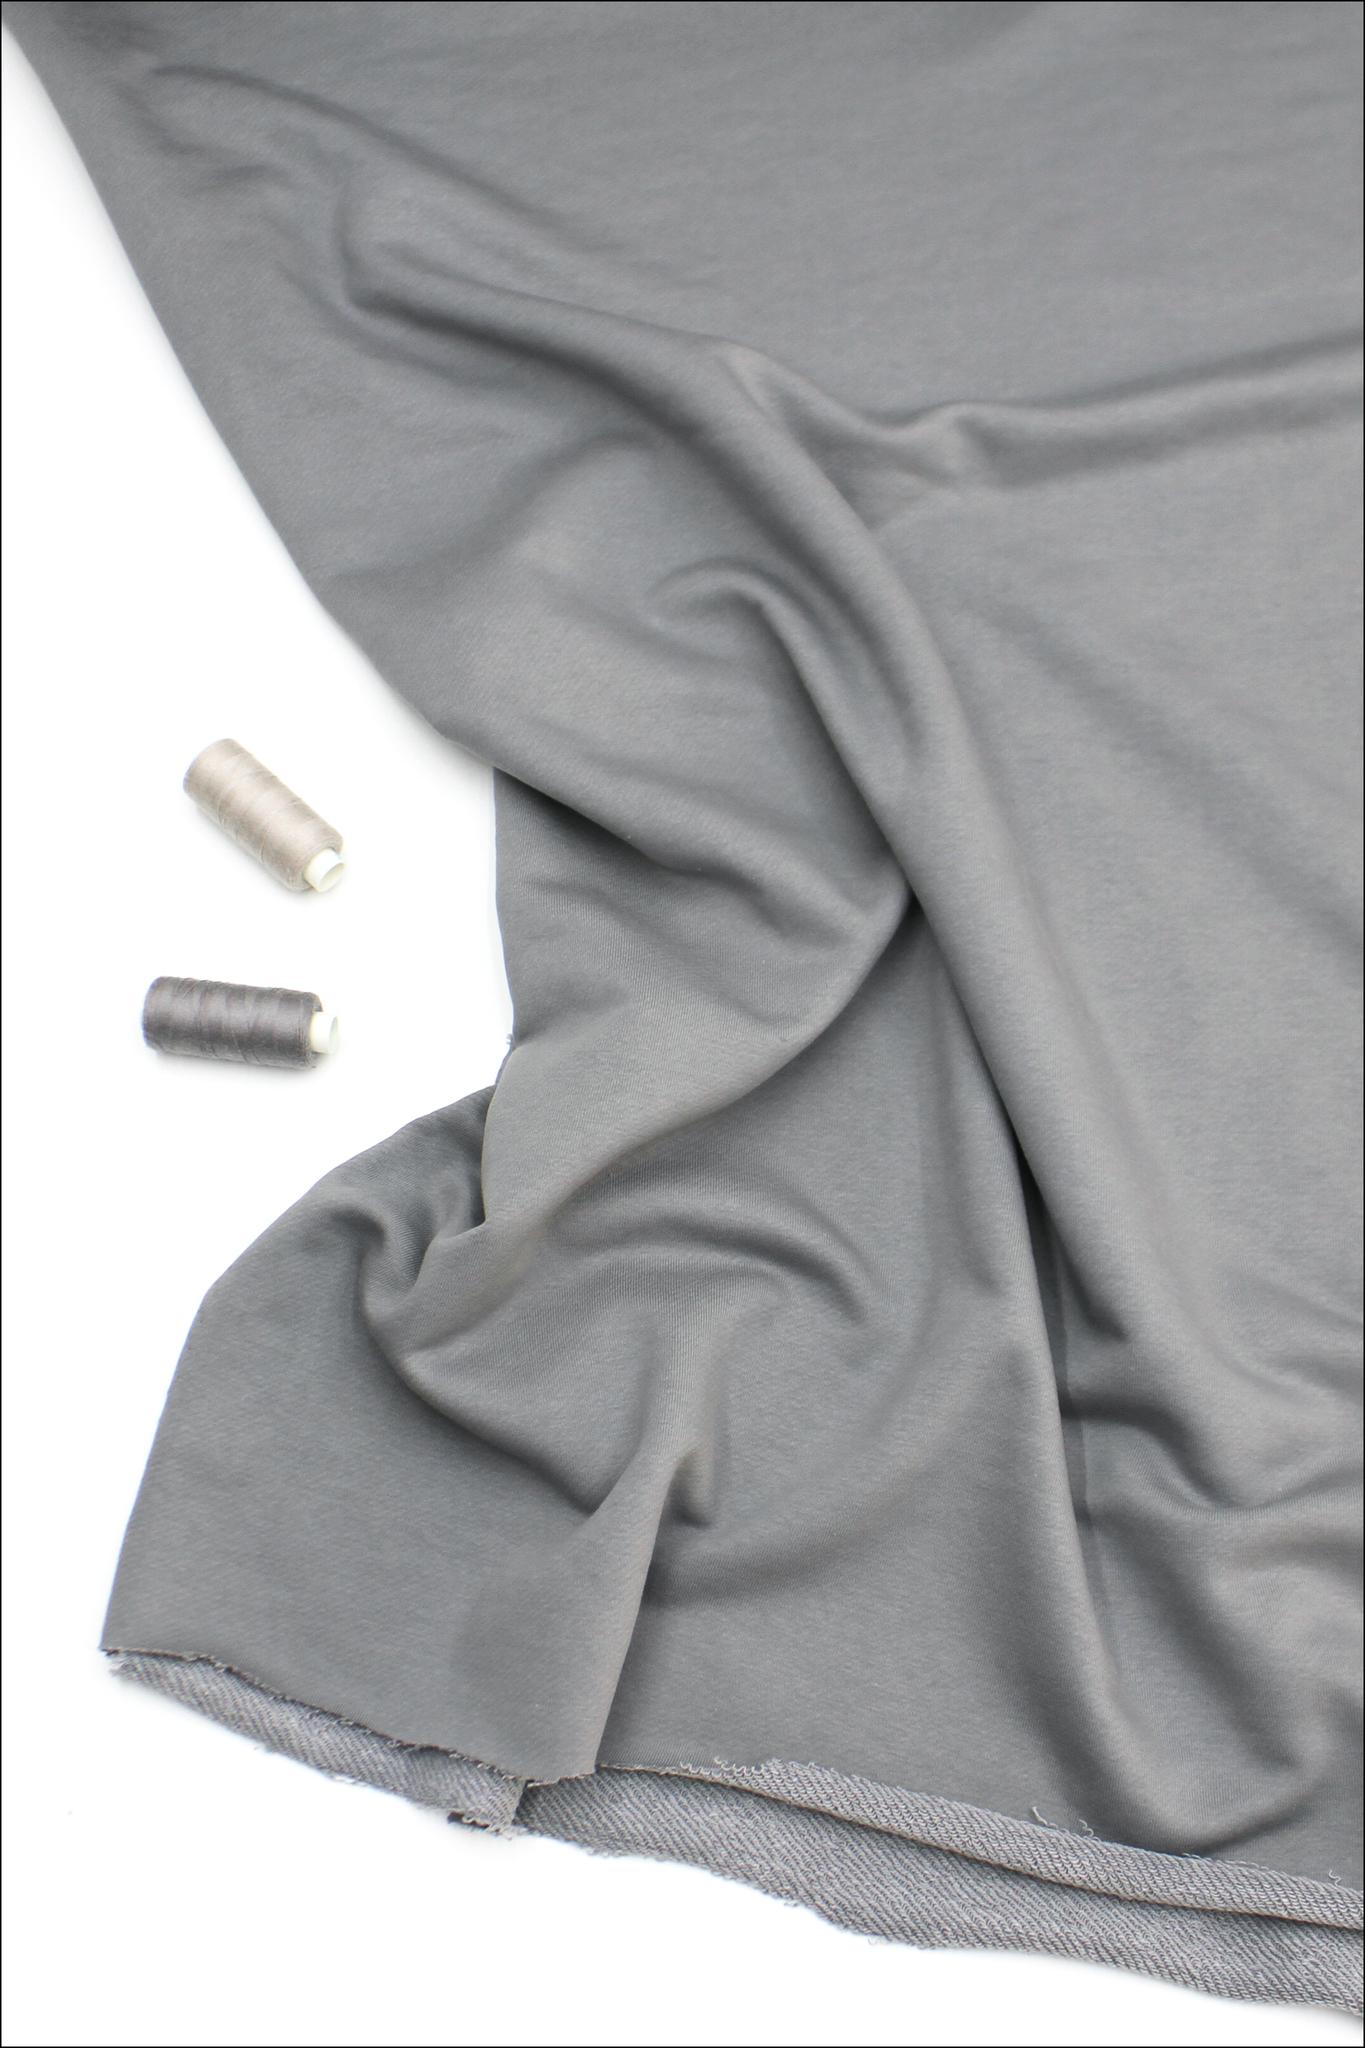 Футер 3х нитка диагональ, серебро , велюр-эффект,330 гр